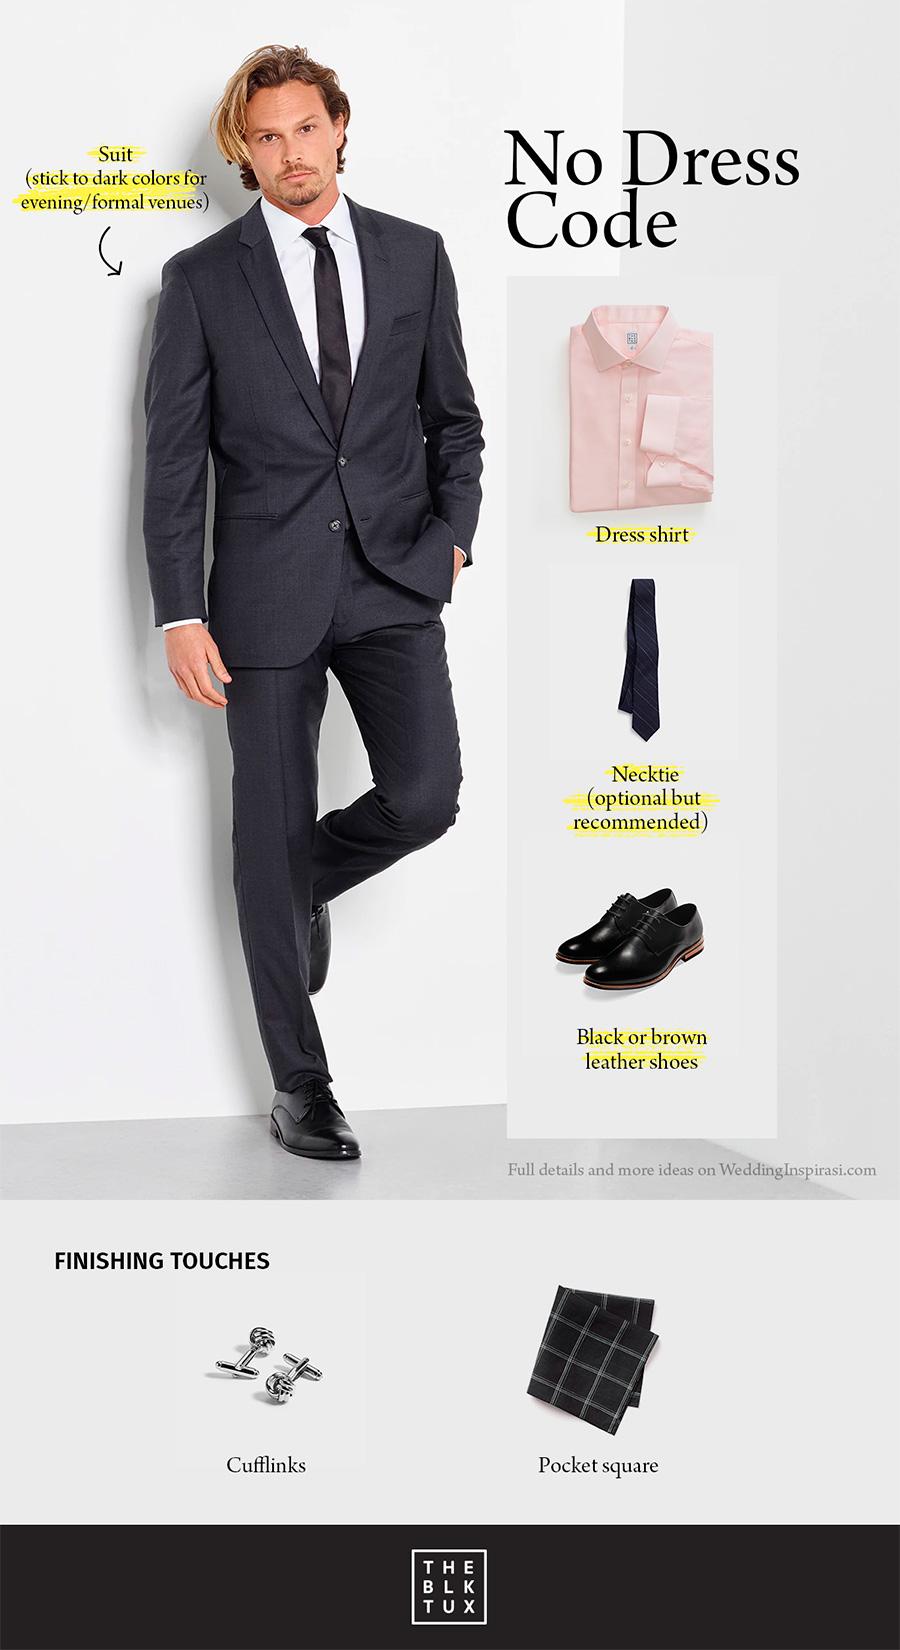 The Black Tux Wedding Dress Code For Men No Modern Style Suit Tuxedo Rental: Black Suit Pink Wedding Dress At Reisefeber.org